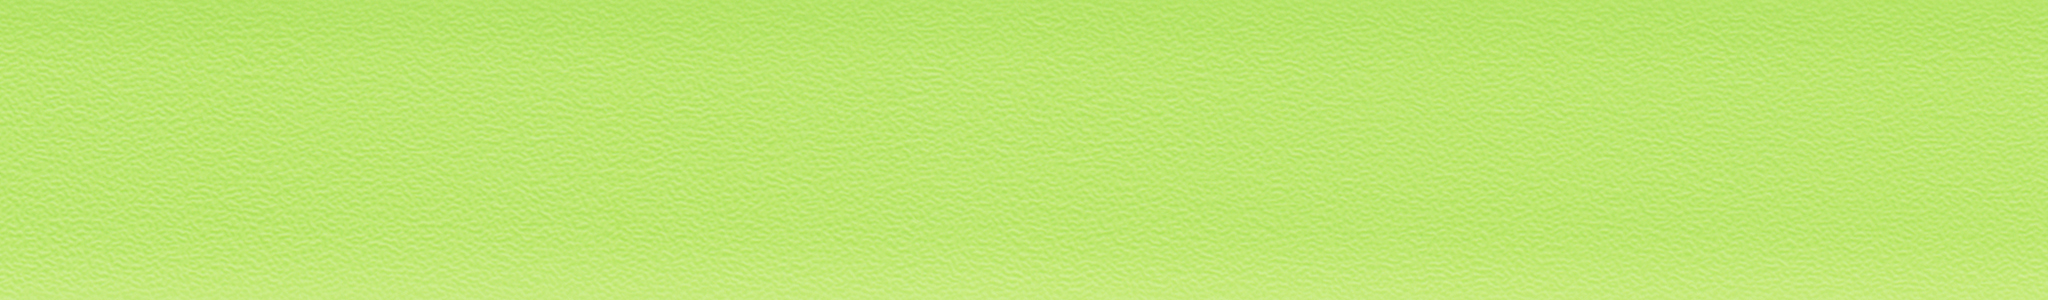 HU 161877 ABS hrana zelená perla 101